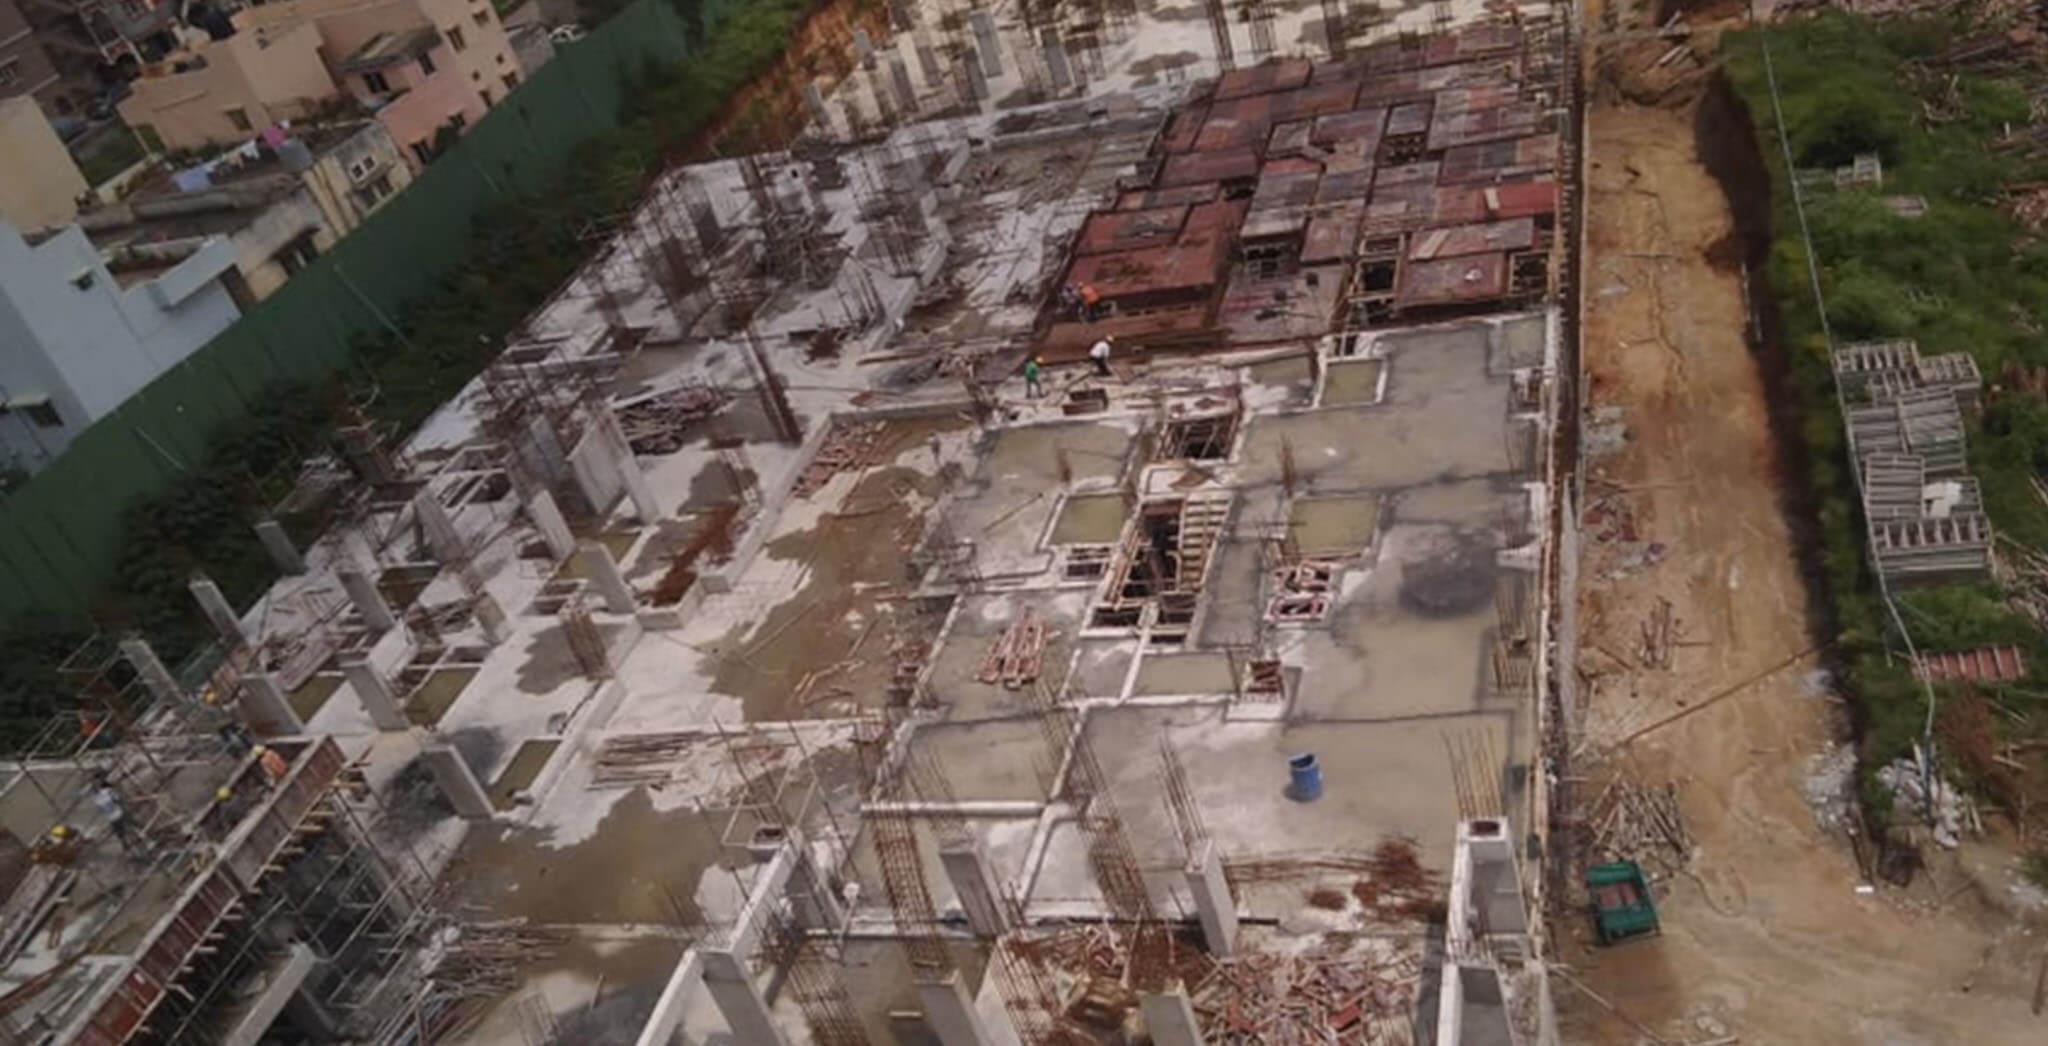 Oct 2019 - Wings H, Q, R: Ground floor slab concreting done; G under progress